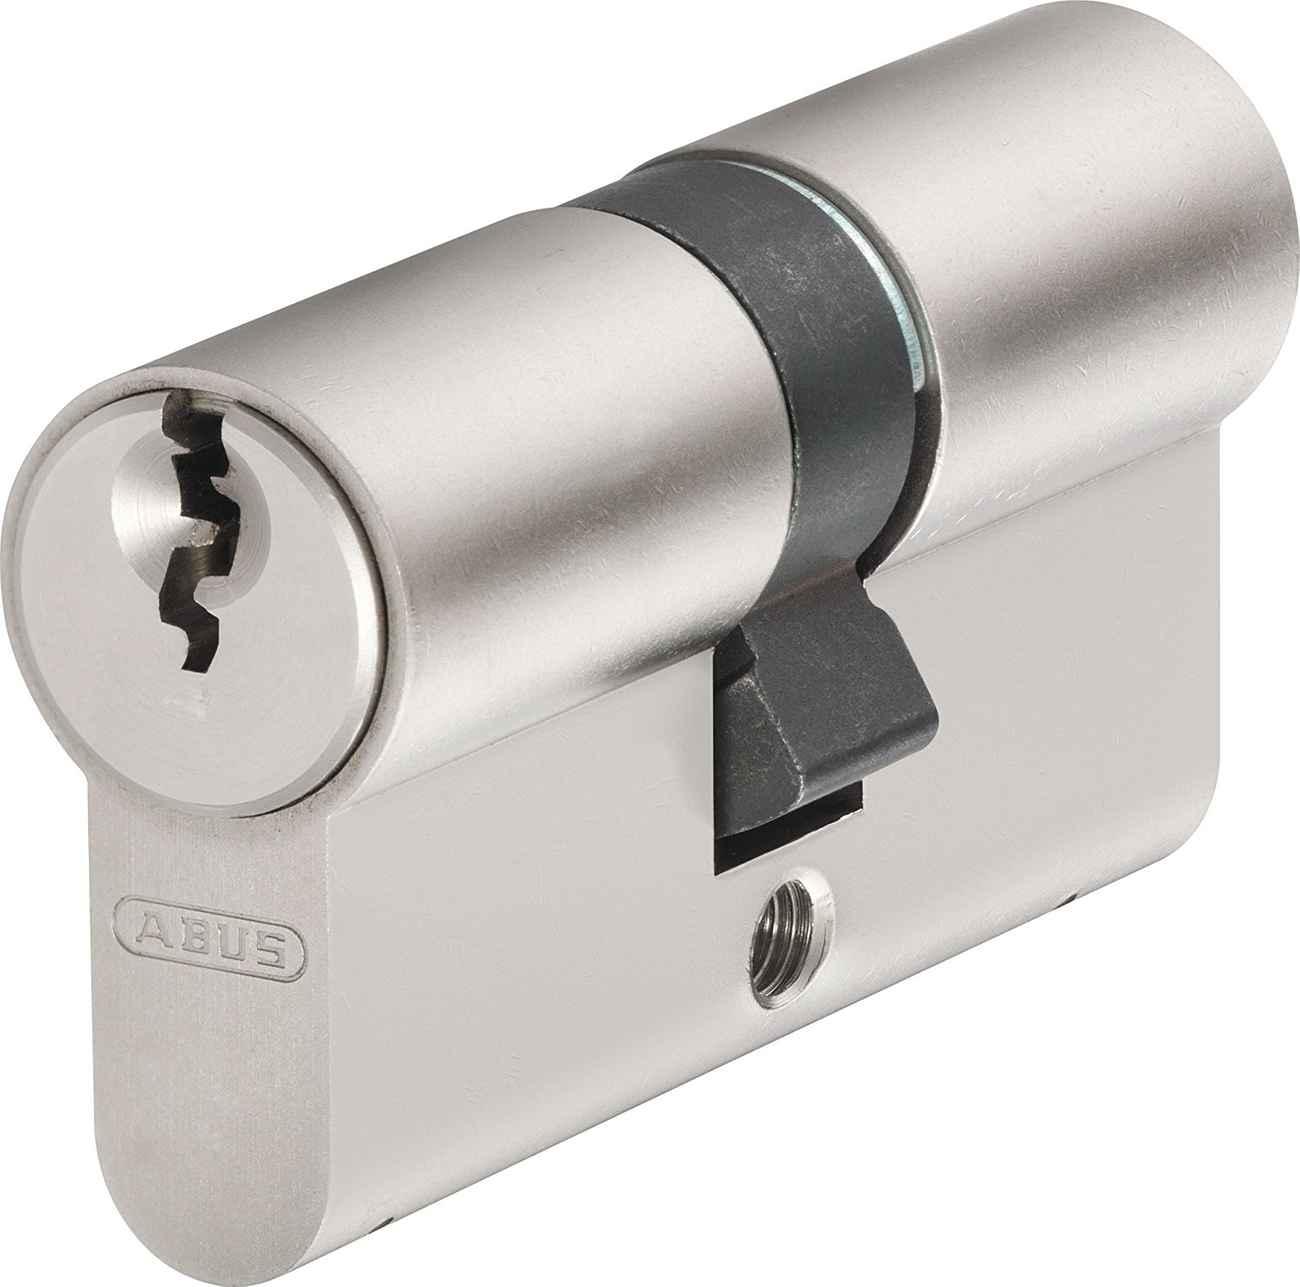 Abus Profilzylinder D6X 30/35 mm, 5 Schlüssel, Codekarte – Bild 1